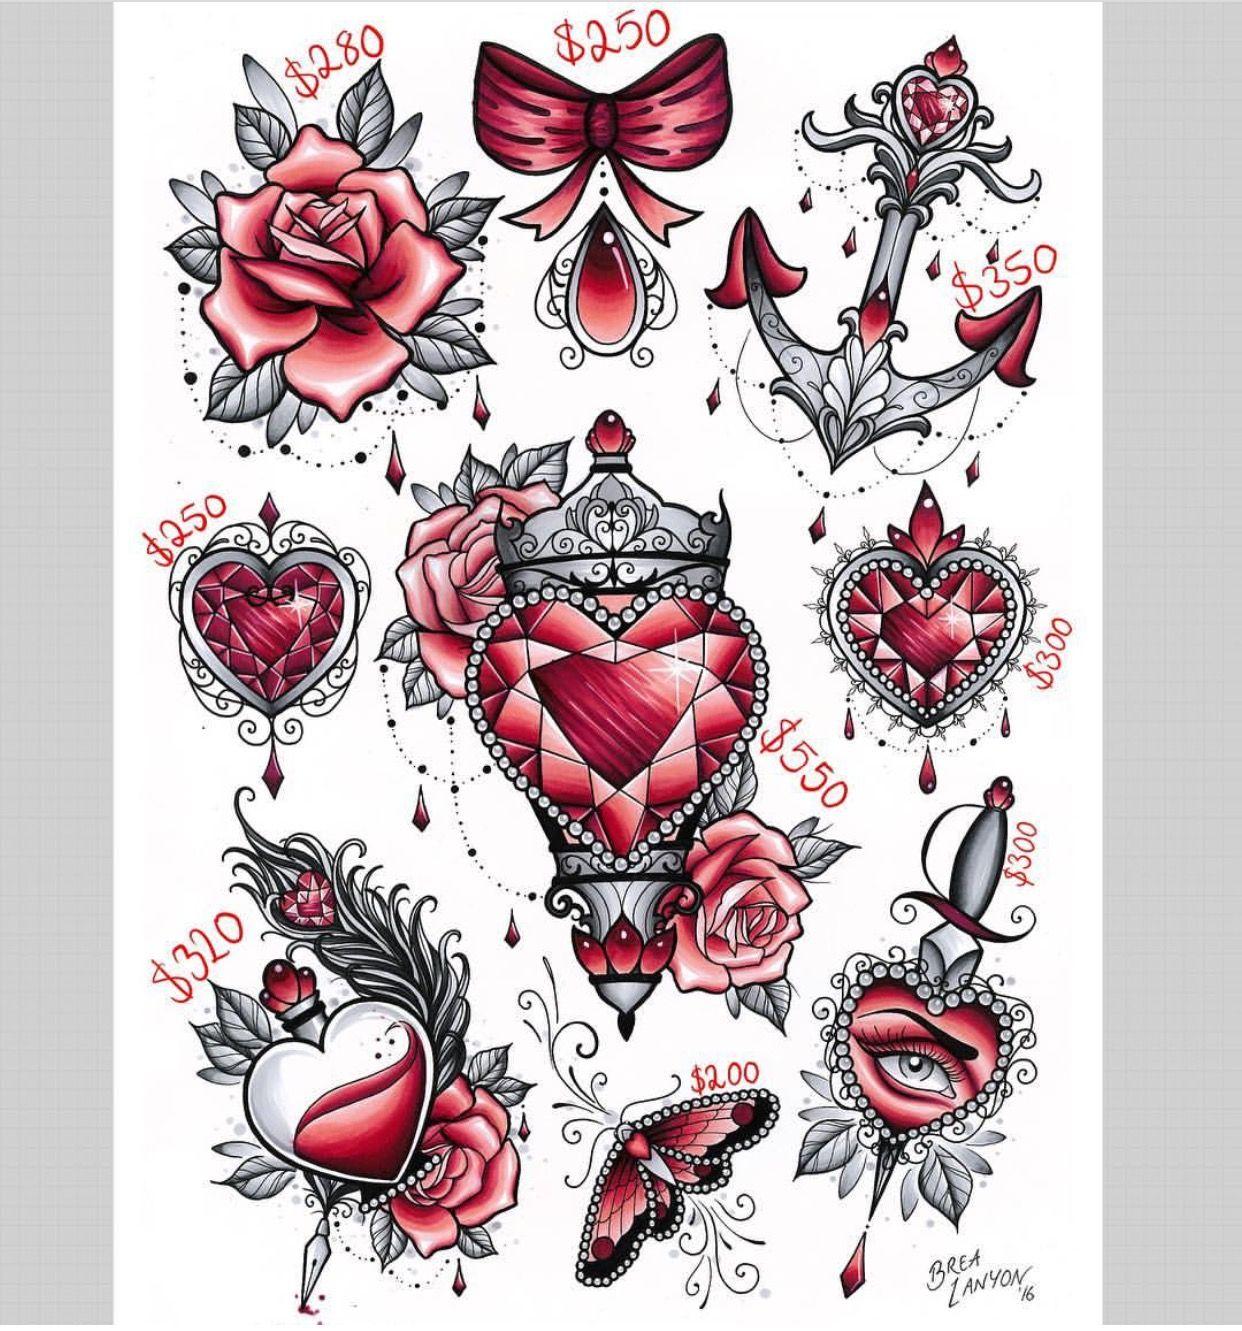 heart shaped bottle tattoo design tattoo ideas pinterest bottle tattoo tattoo designs and. Black Bedroom Furniture Sets. Home Design Ideas